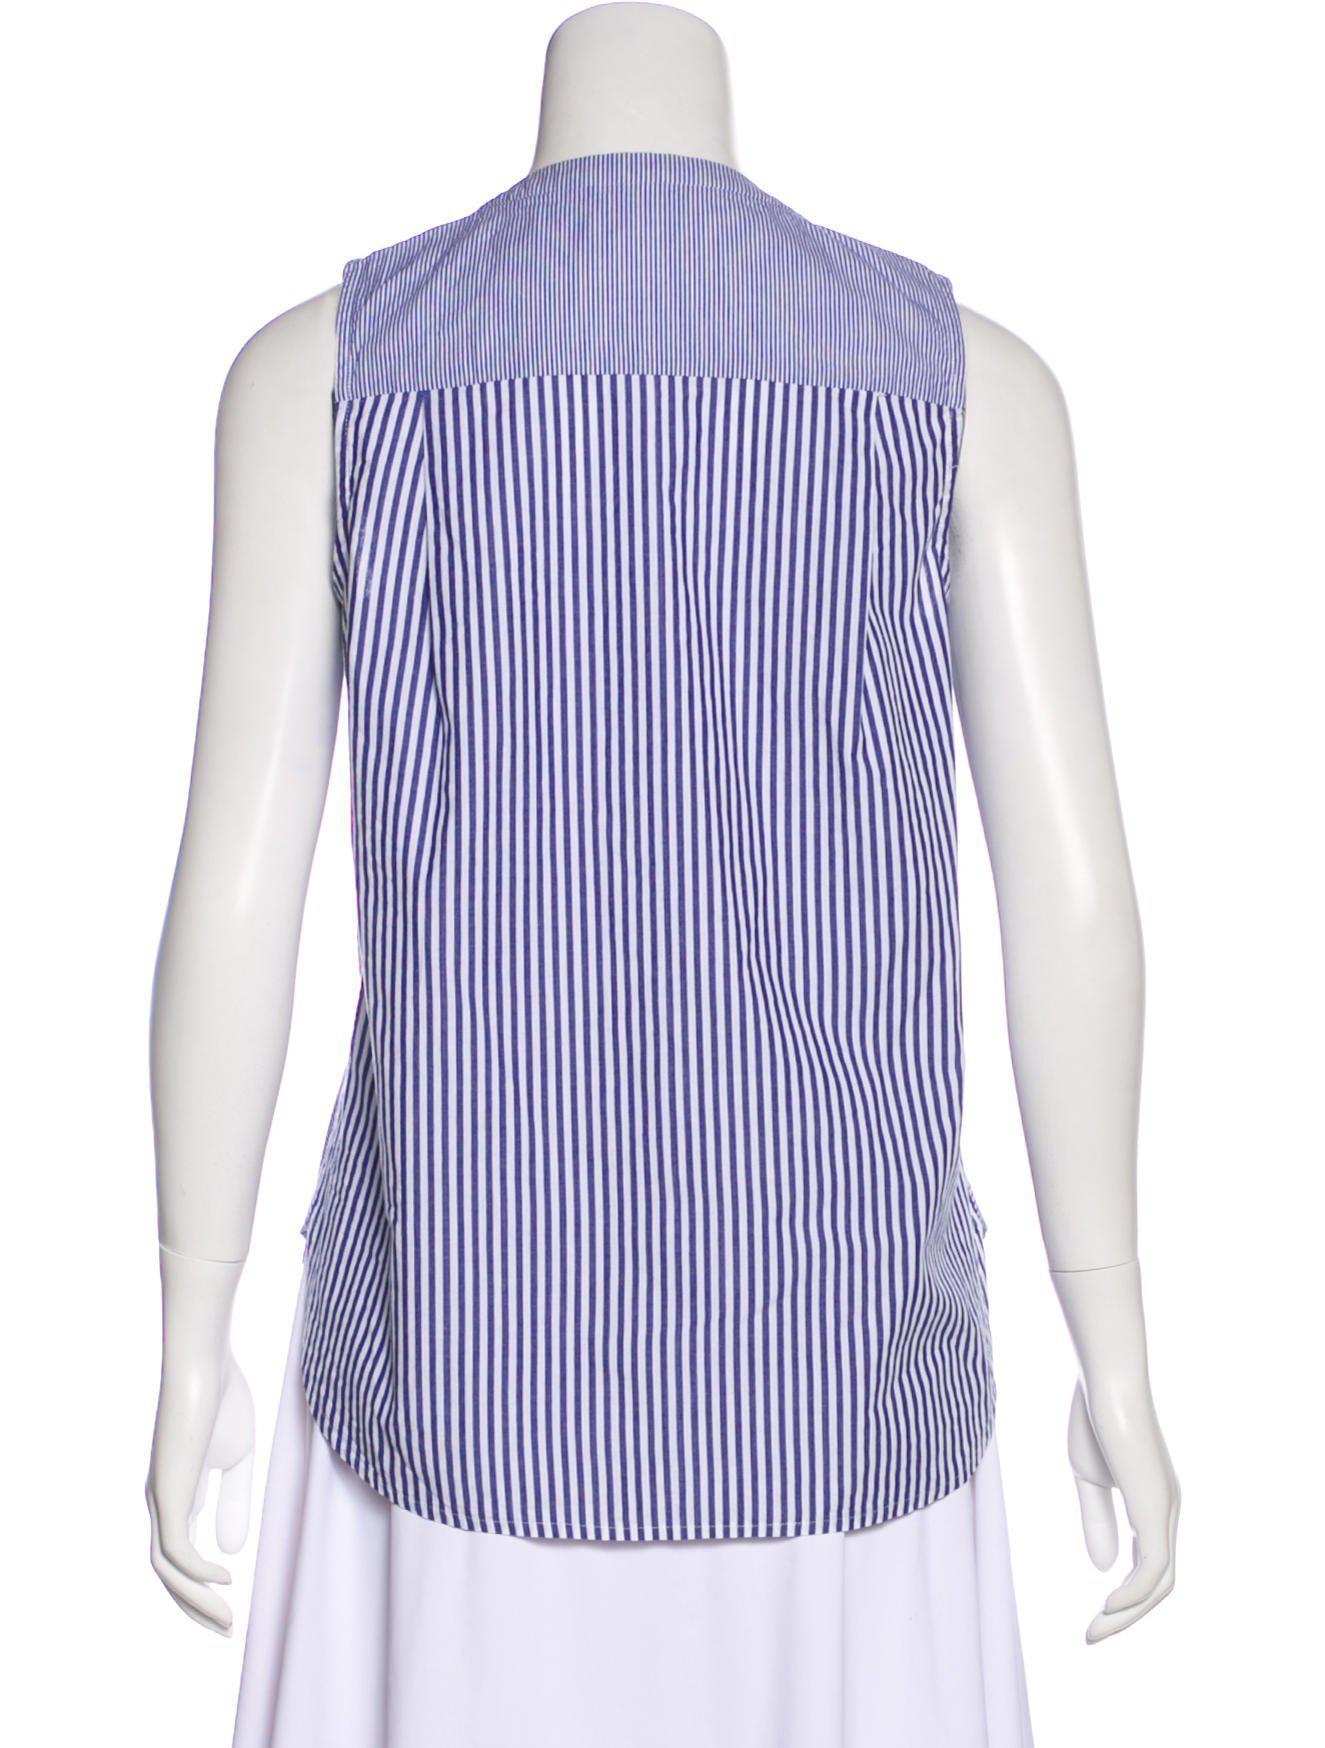 9f6e792db4f7d Lyst - Derek Lam 10 Crosby Striped Sleeveless Top in Blue